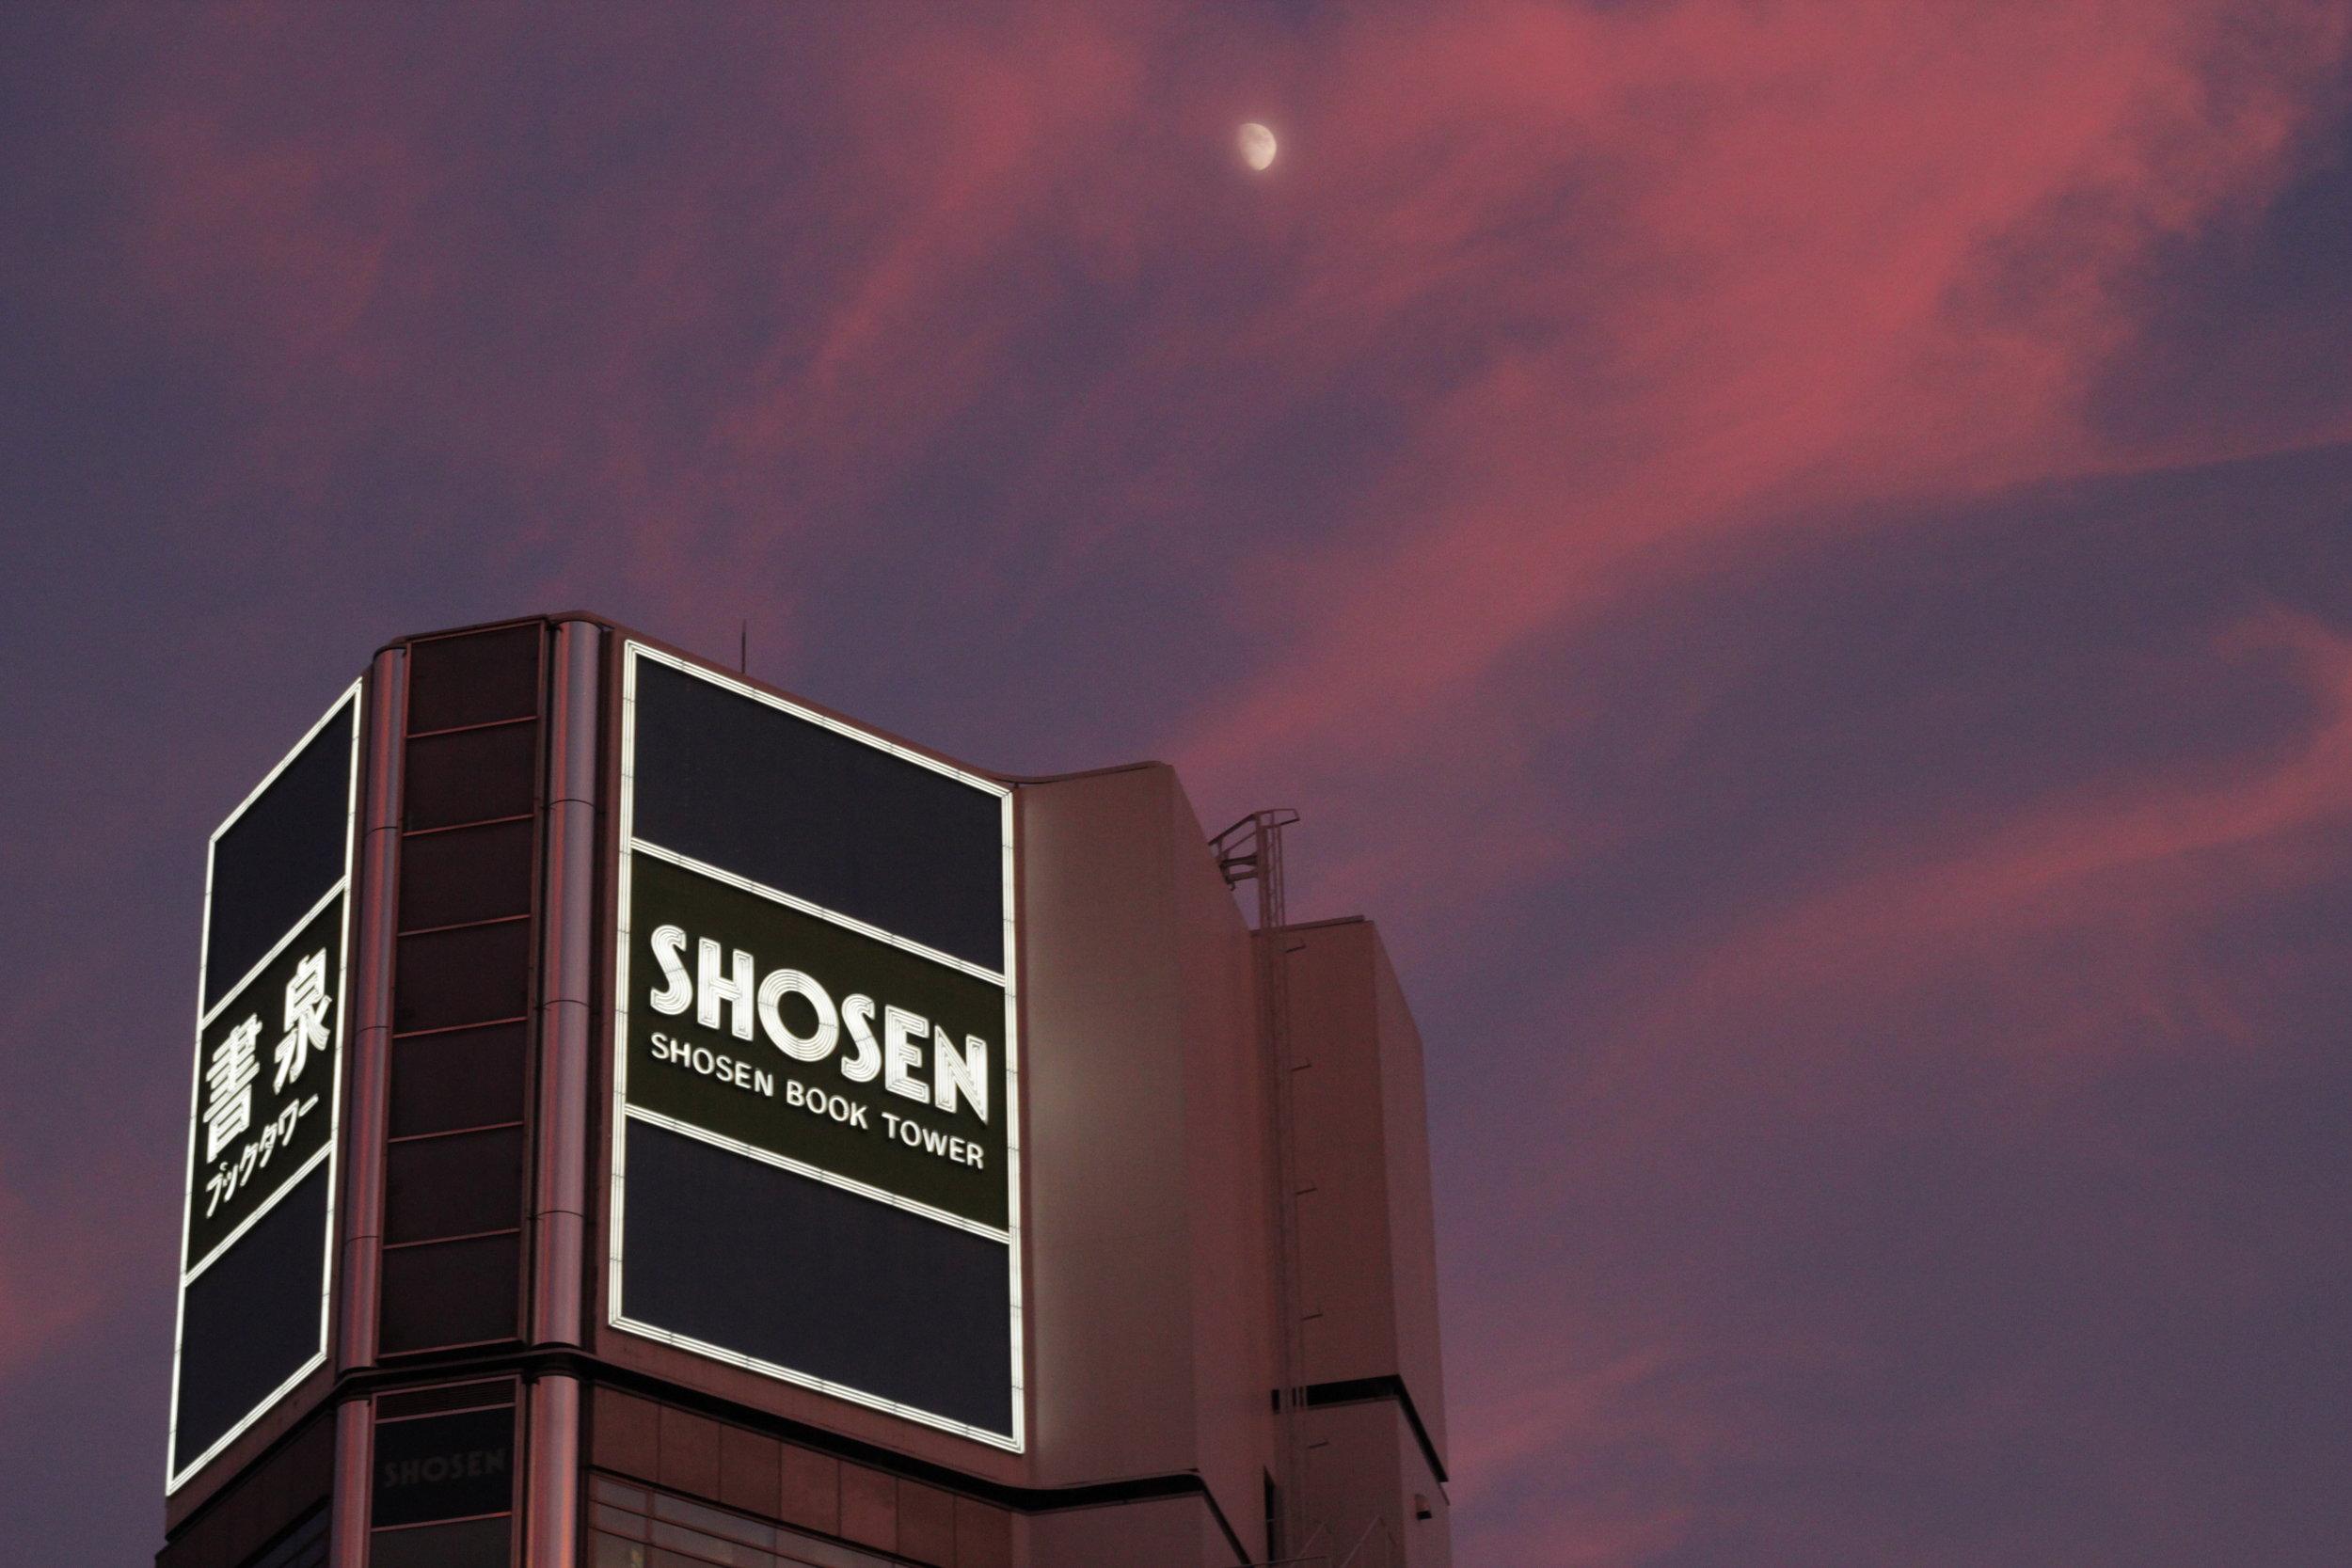 A beautiful moon near Shosen Book Tower in Akiba